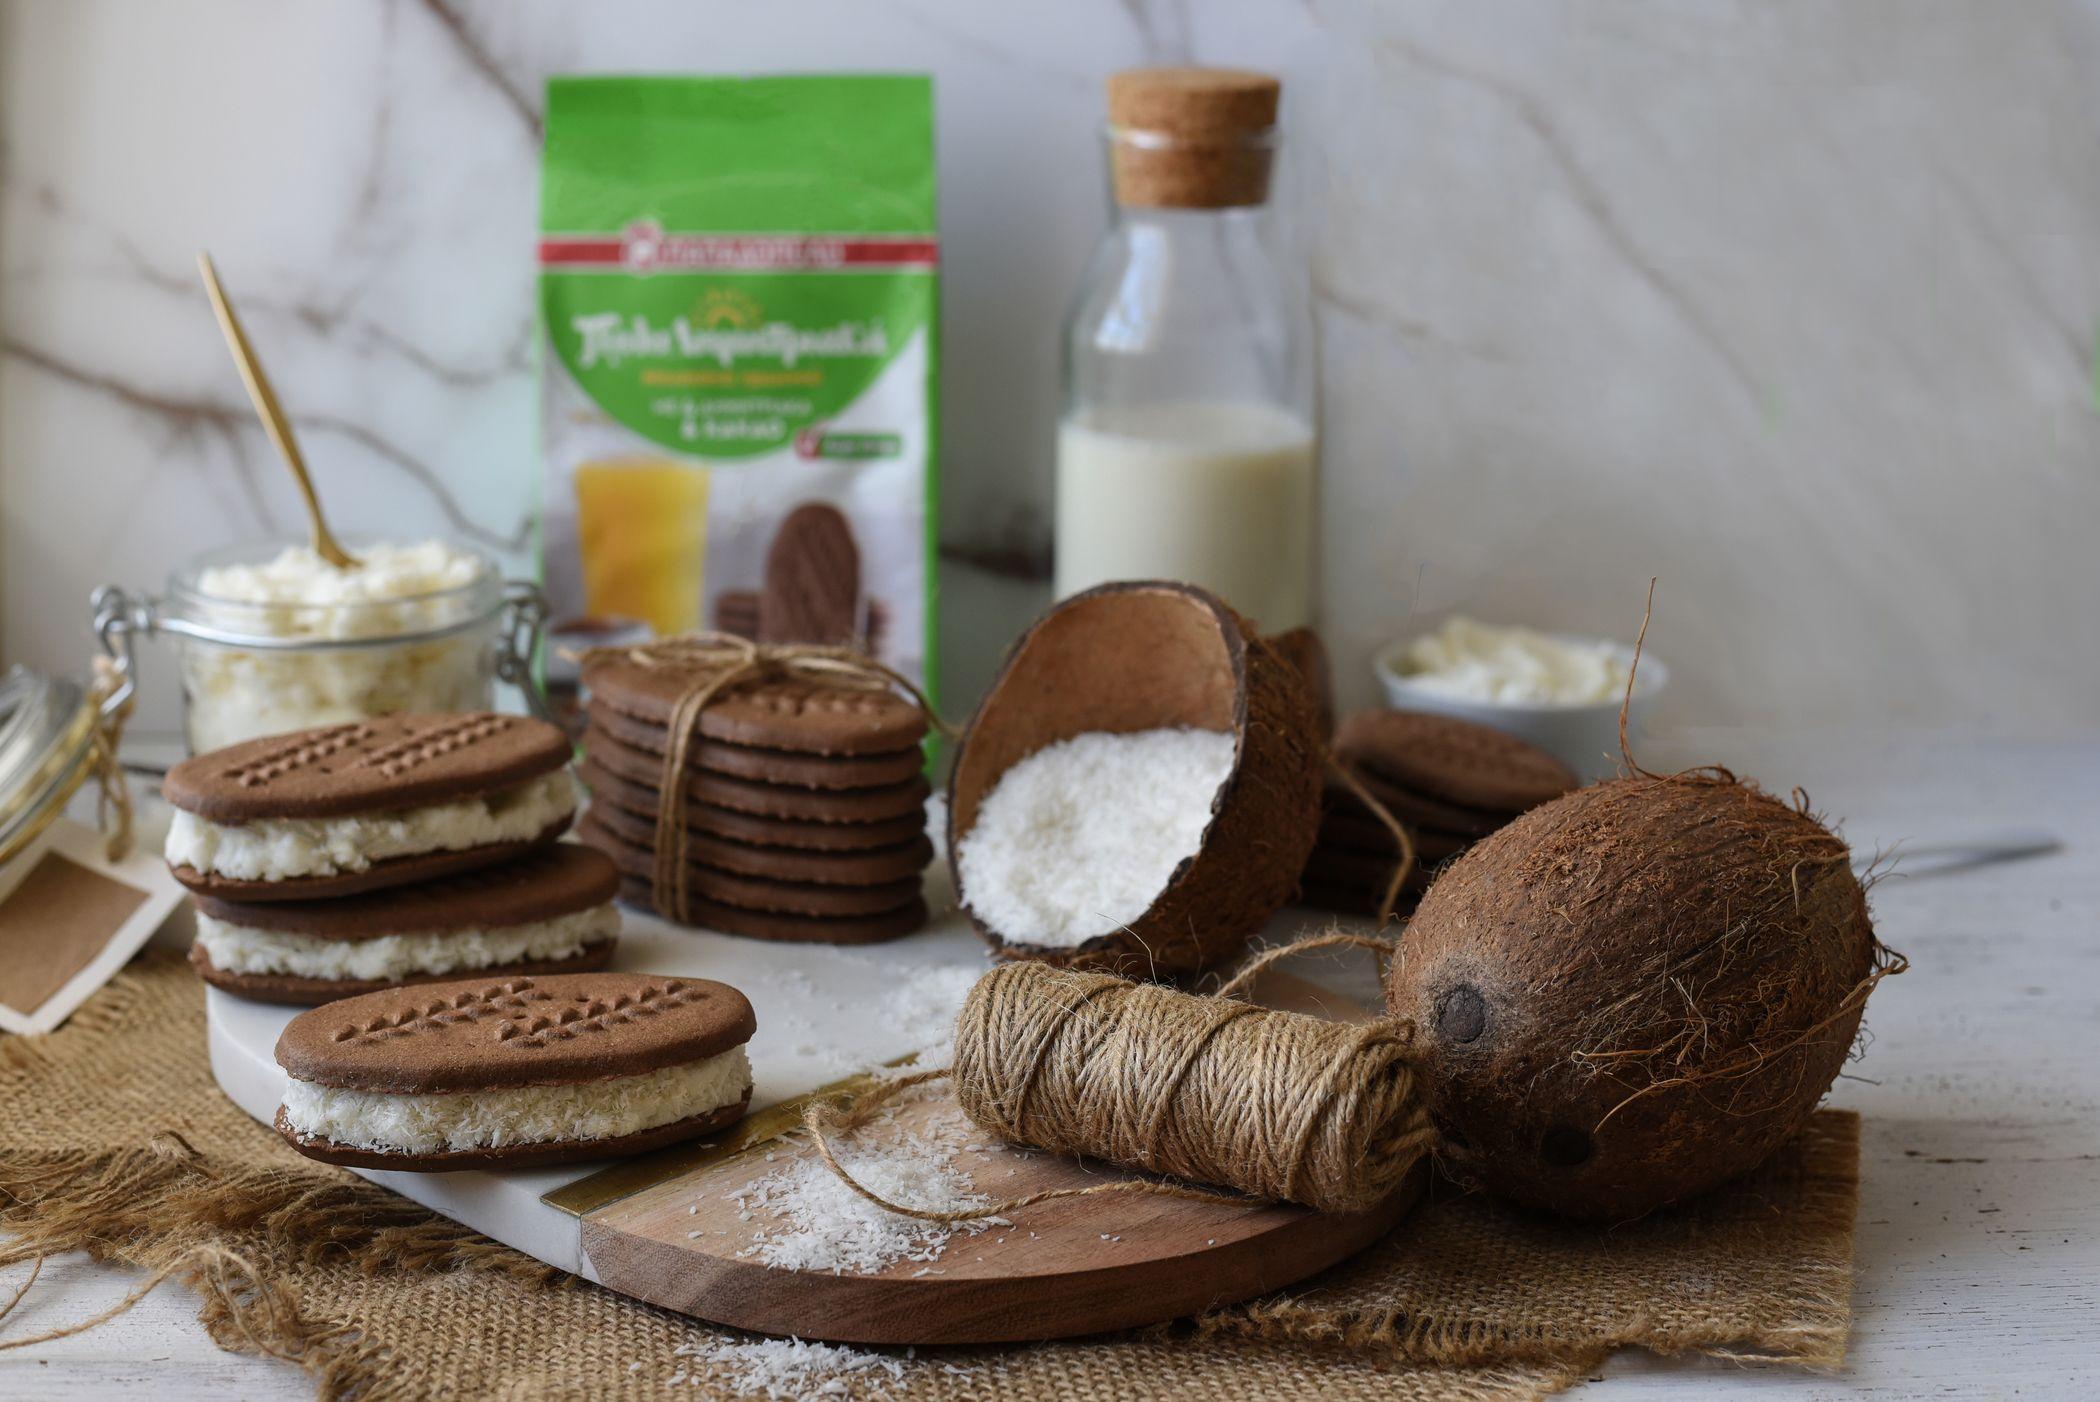 Image for Sandwich μπισκότου χωρίς ζάχαρη με ΠολυΔημητριακά και γέμιση κρέμα καρύδας